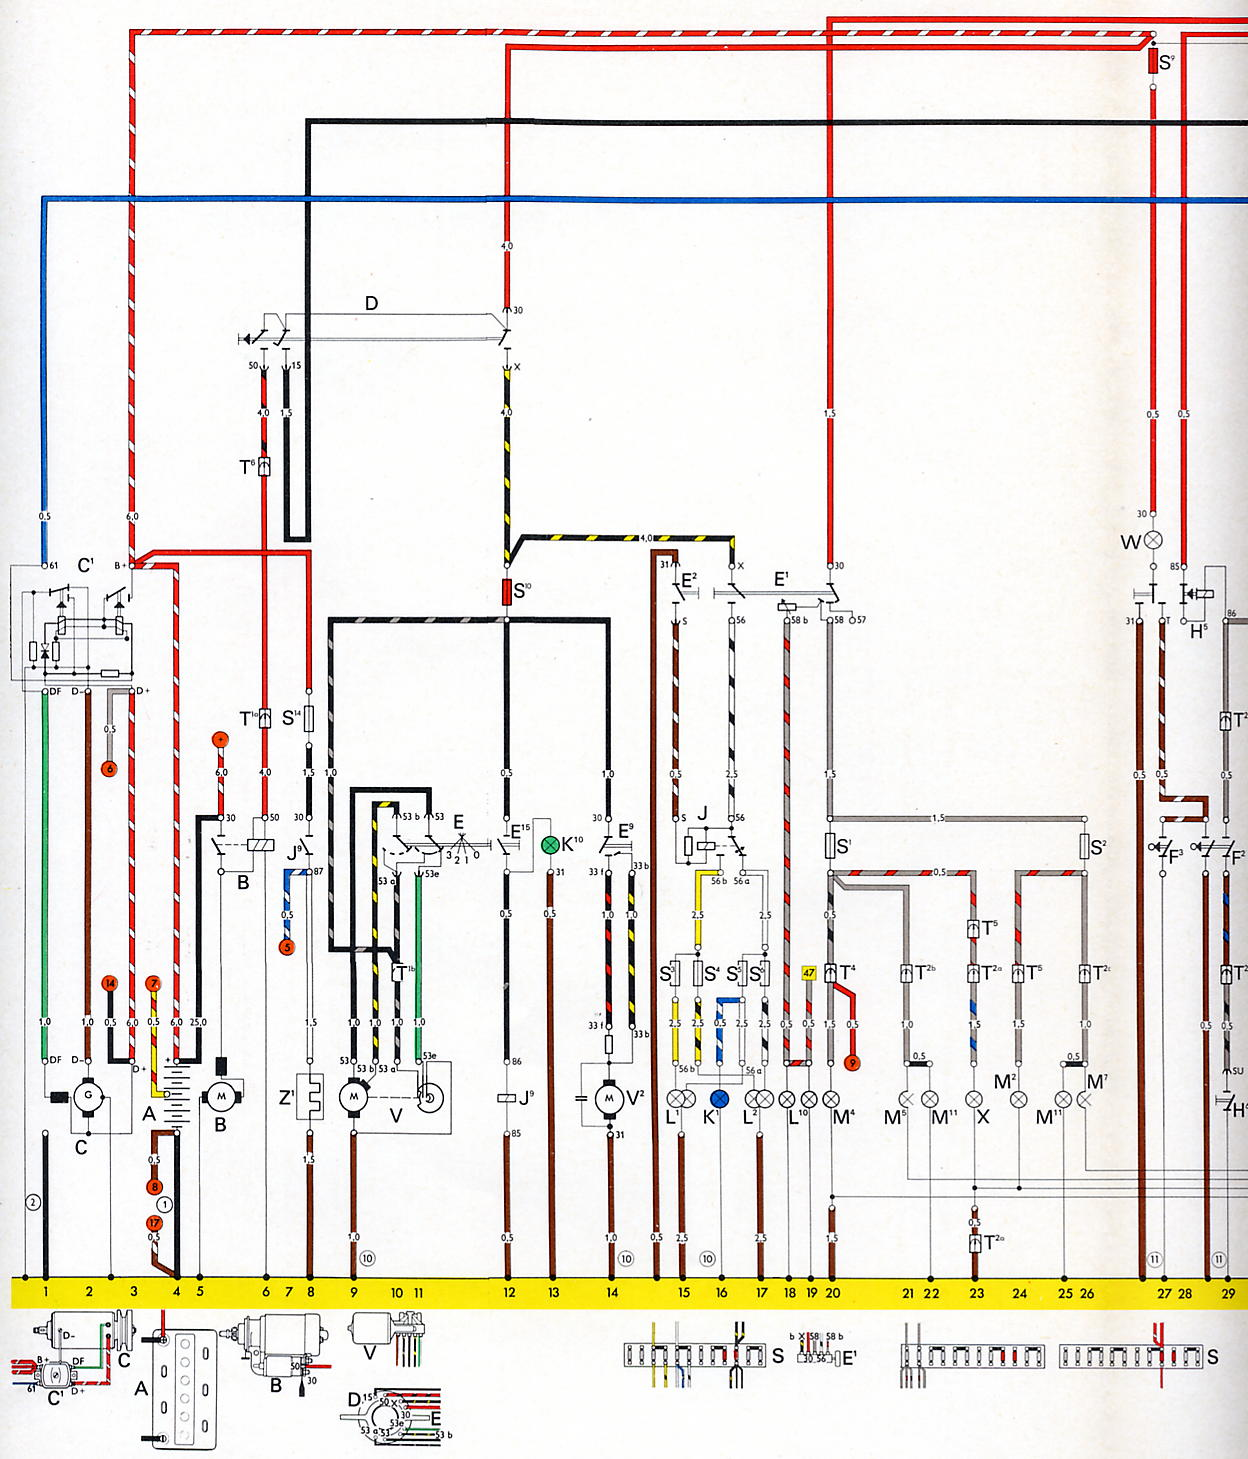 hight resolution of 73 super beetle voltage regulator shoptalkforums com rh shoptalkforums com kohler voltage regulator wiring diagram dodge